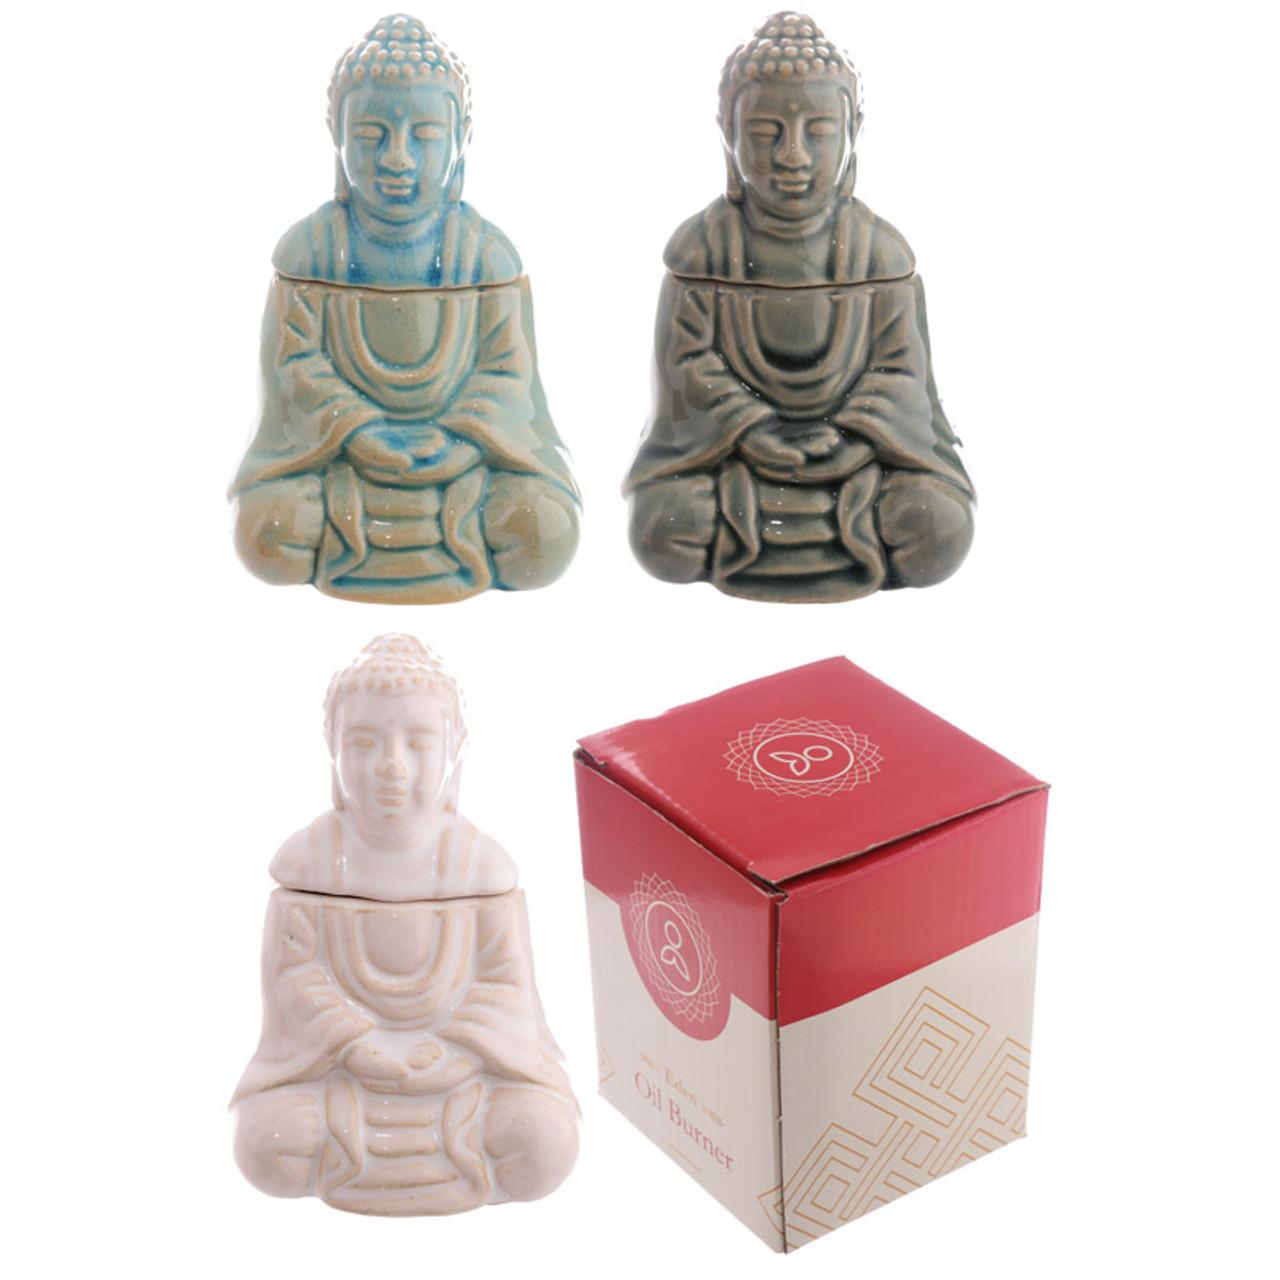 Ceramic Seated Thai Buddha Oil Burner With Lid